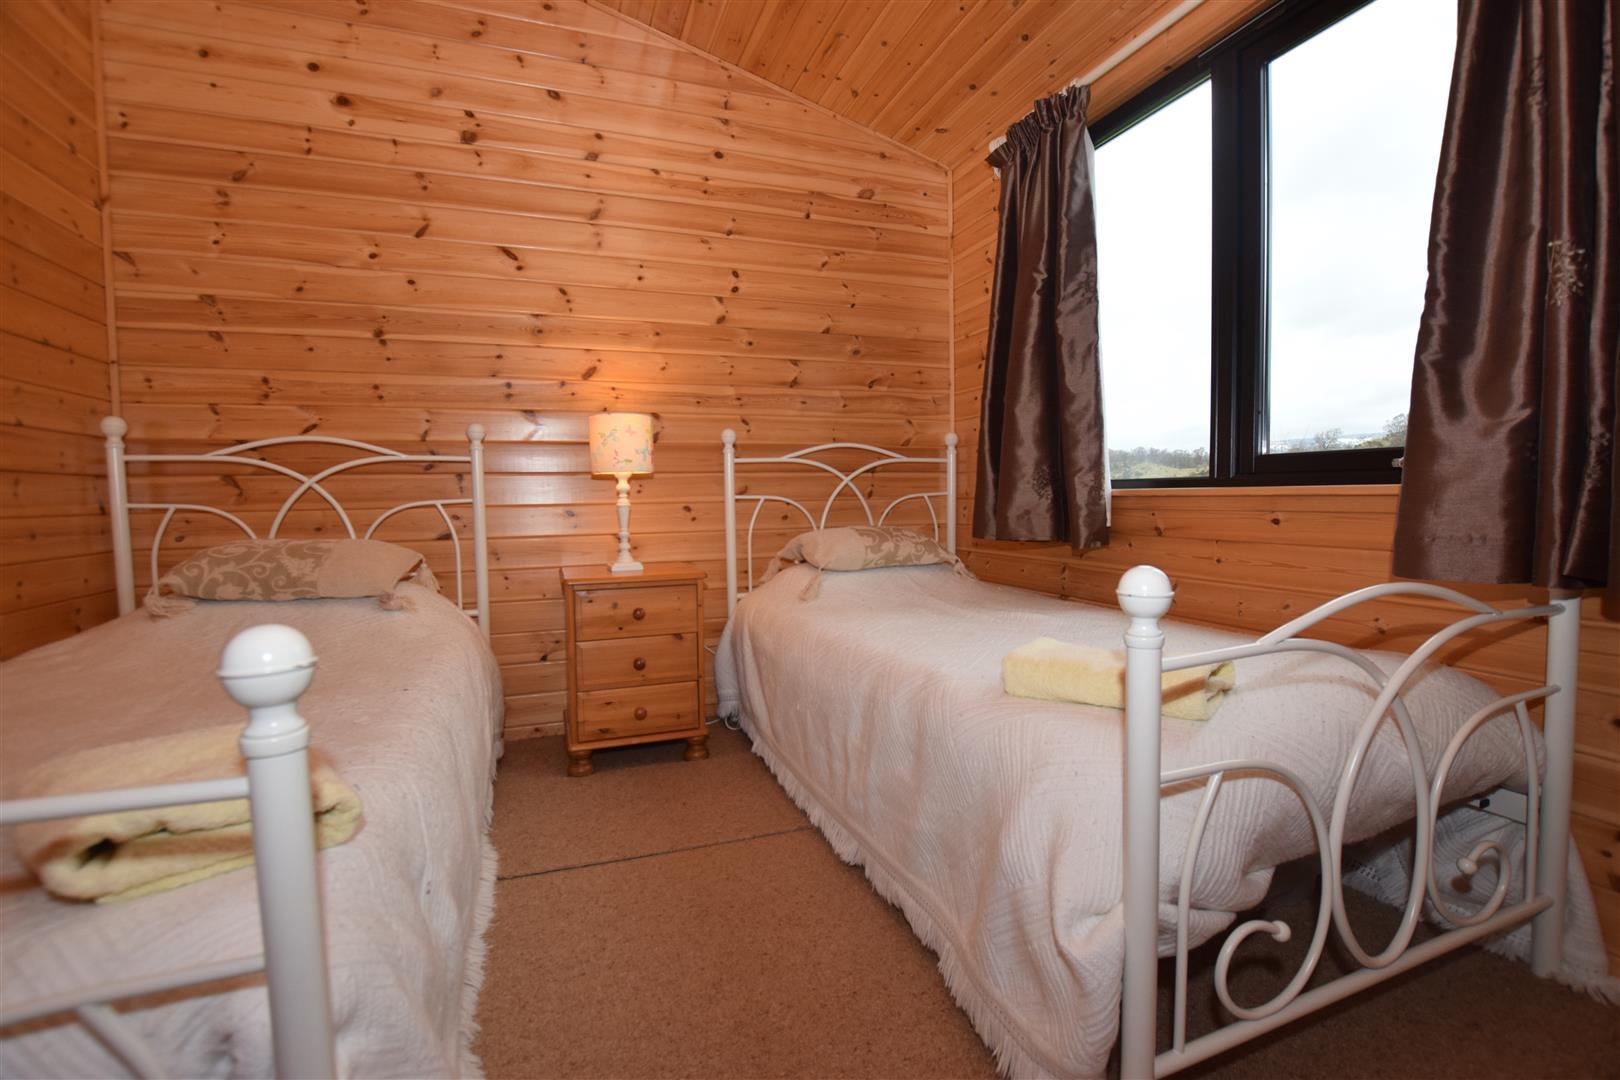 2, Whitehills Lodge, Glenisla, Perthshire, PH11 8PF, UK